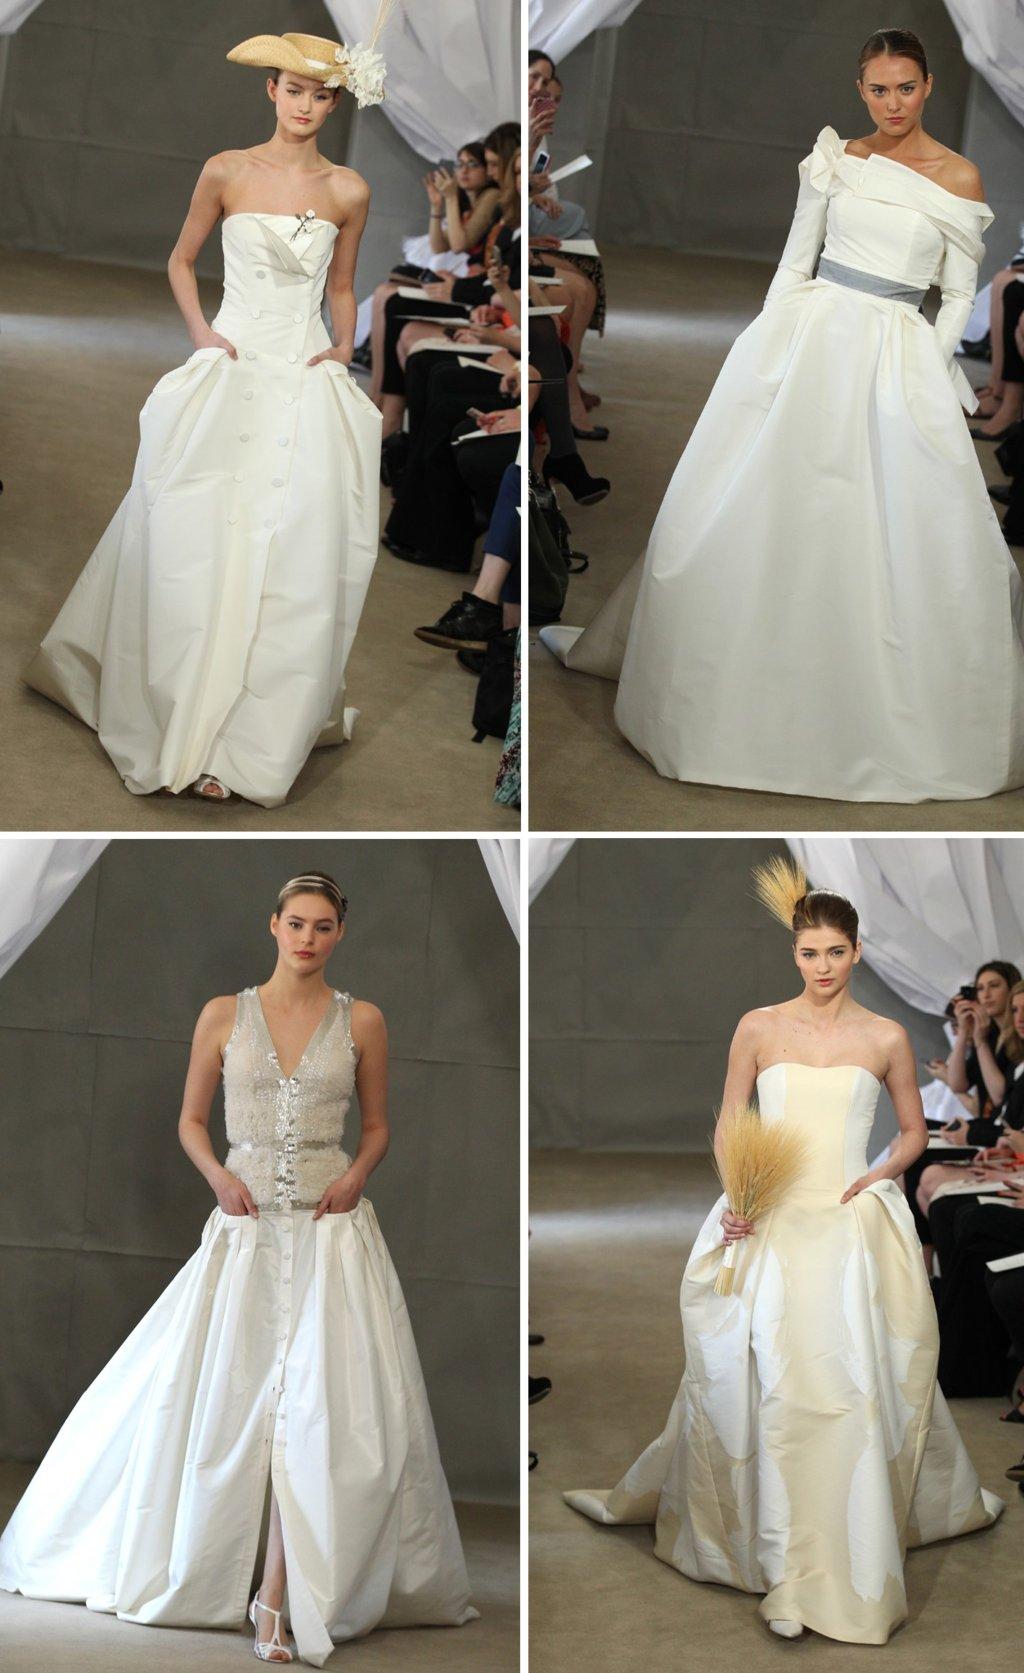 wedding dress trends pockets carolina herrera bridal gowns wedding dress with pockets wedding dress trends pockets carolina herrera bridal gowns